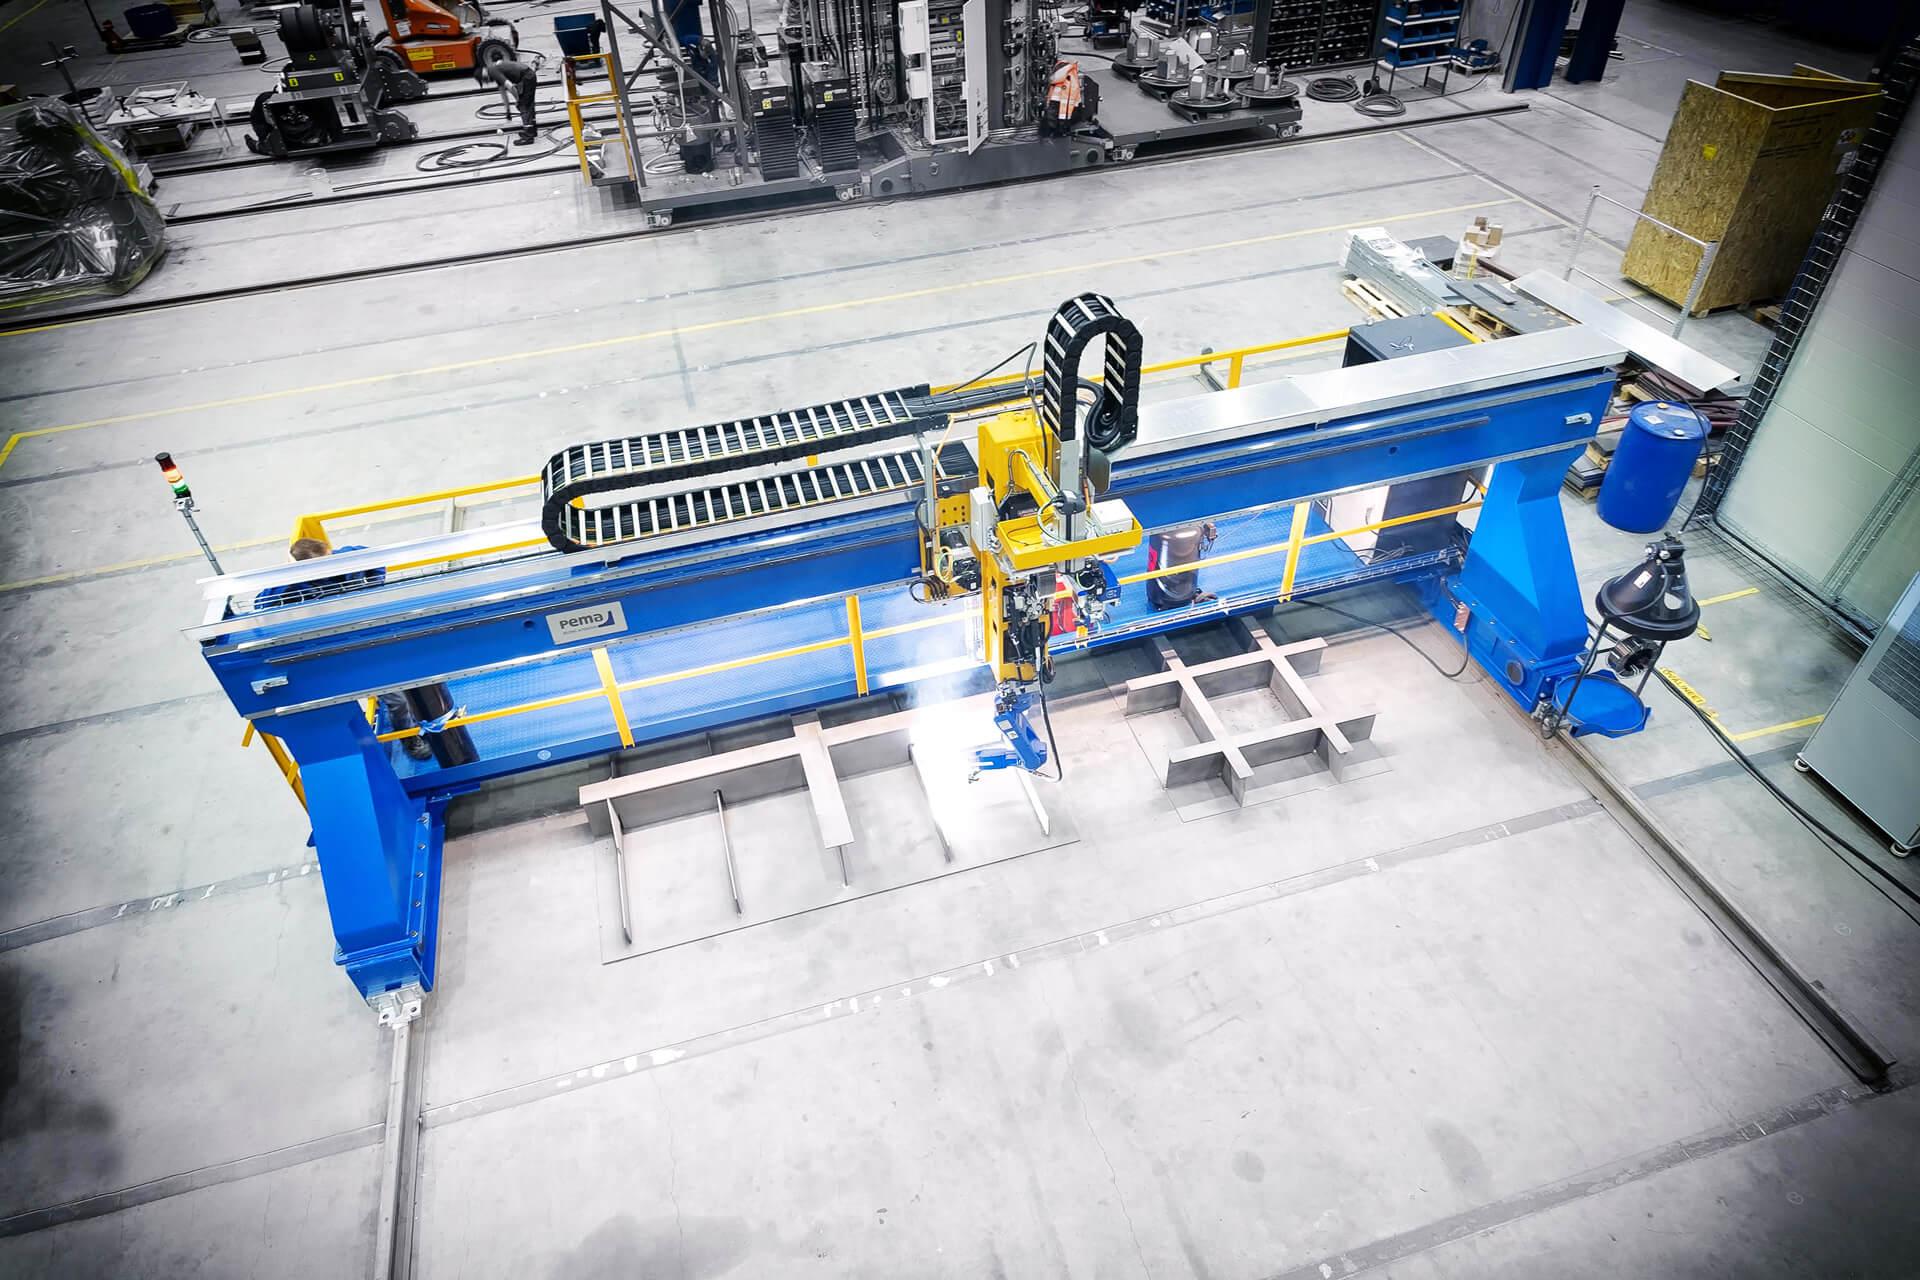 A Pemamek PEMA Weldcontrol 200 welding robot